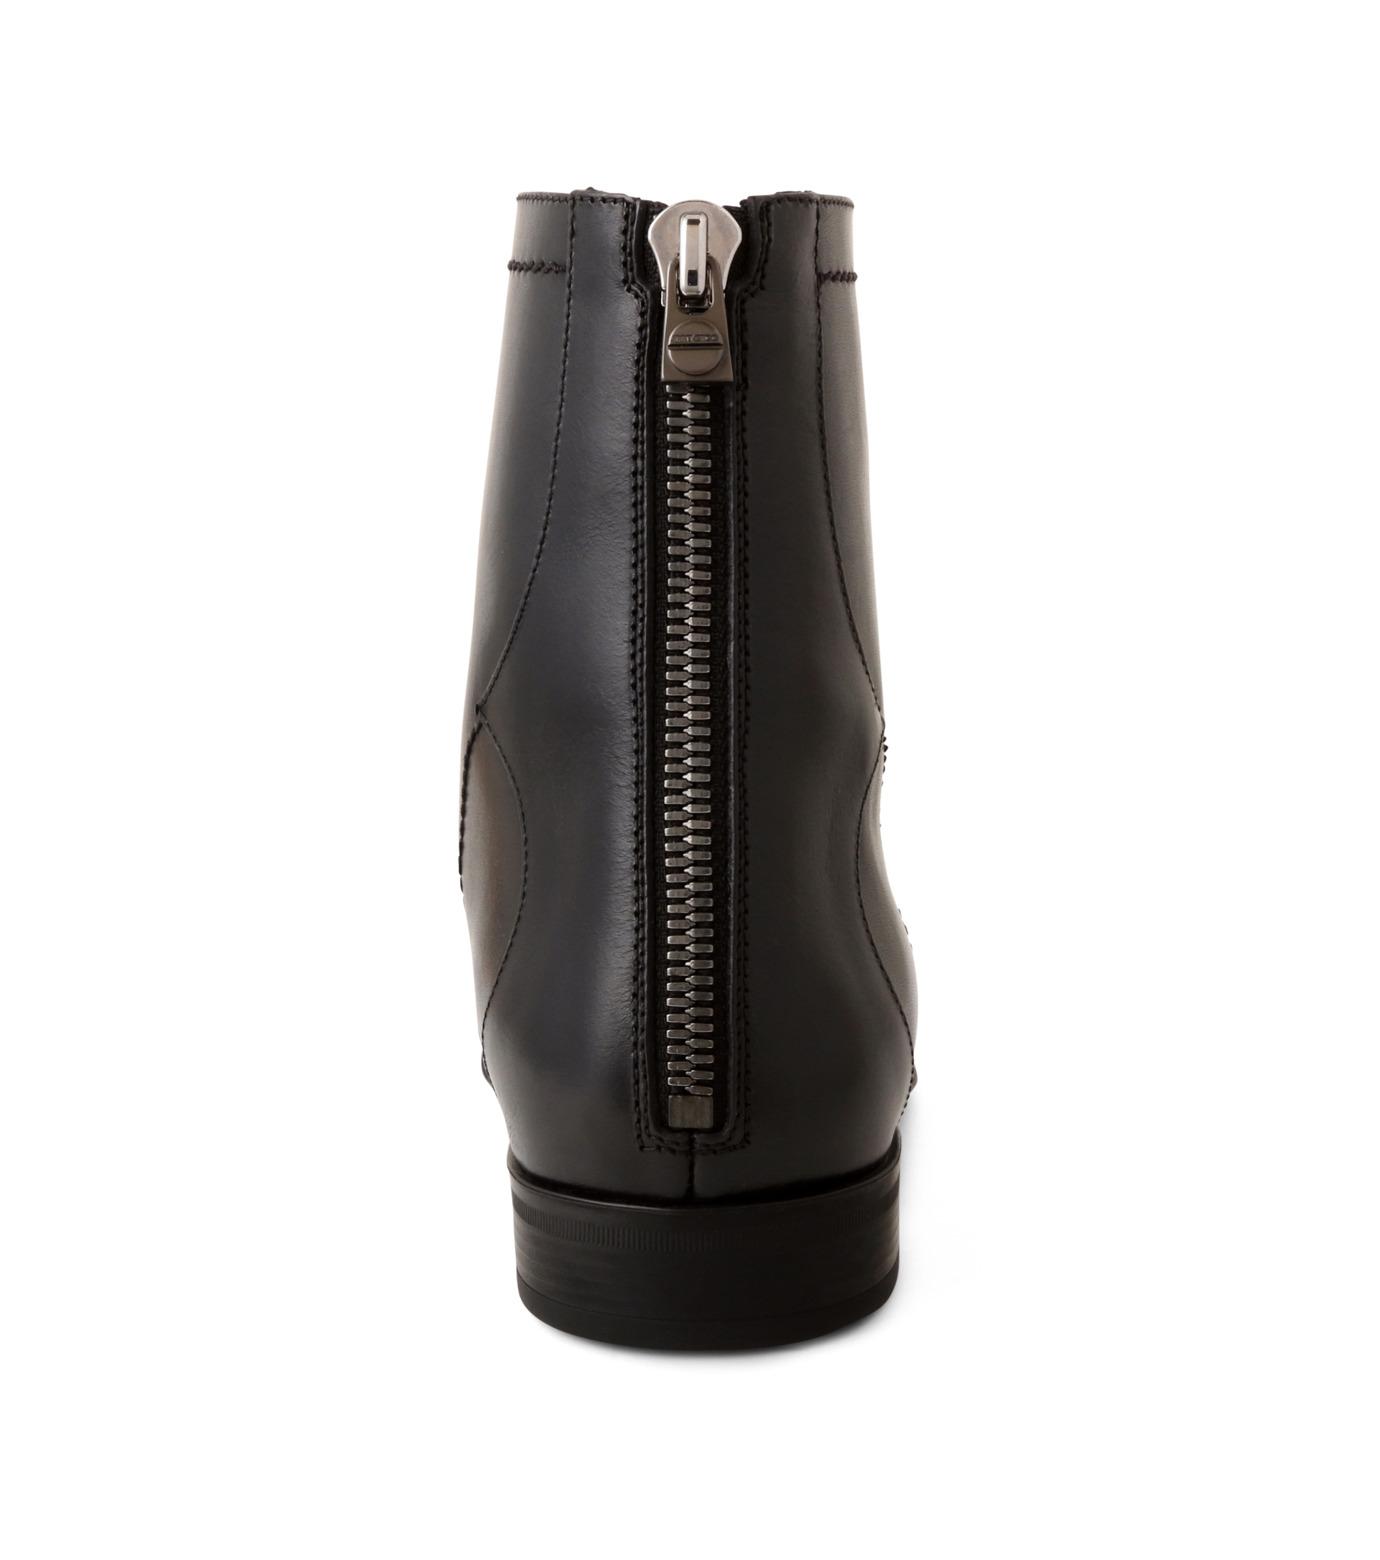 Jimmy Choo(ジミーチュウ)のMouton Boots-BLACK(ブーツ/boots)-PABLO-SVS-13 拡大詳細画像2